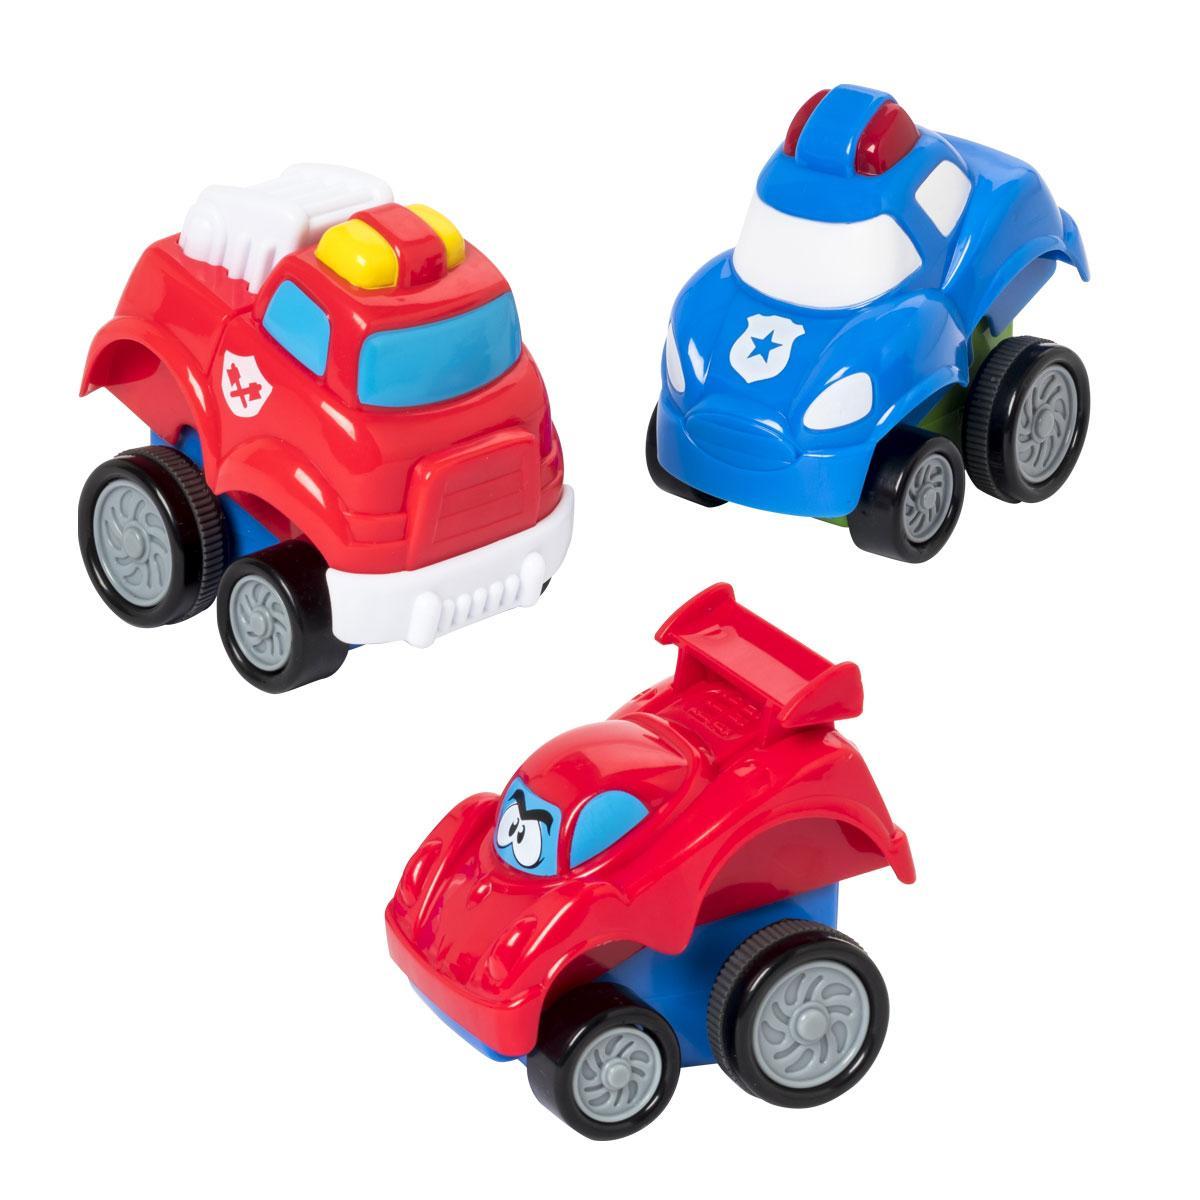 Set de 3 voitures press and go